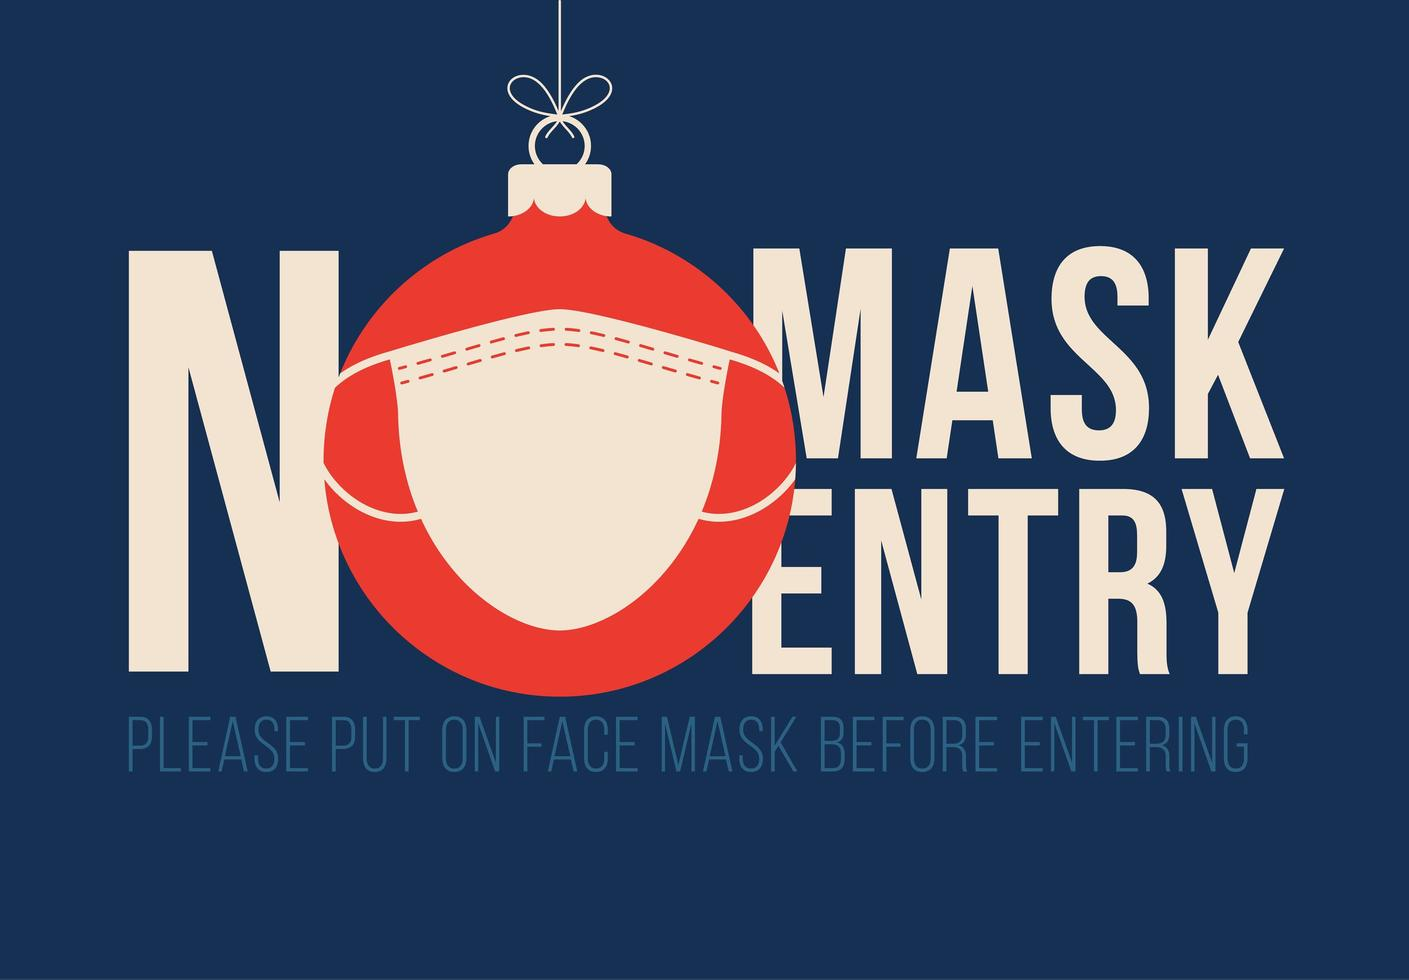 No mask no entry masked Christmas ornament sign vector